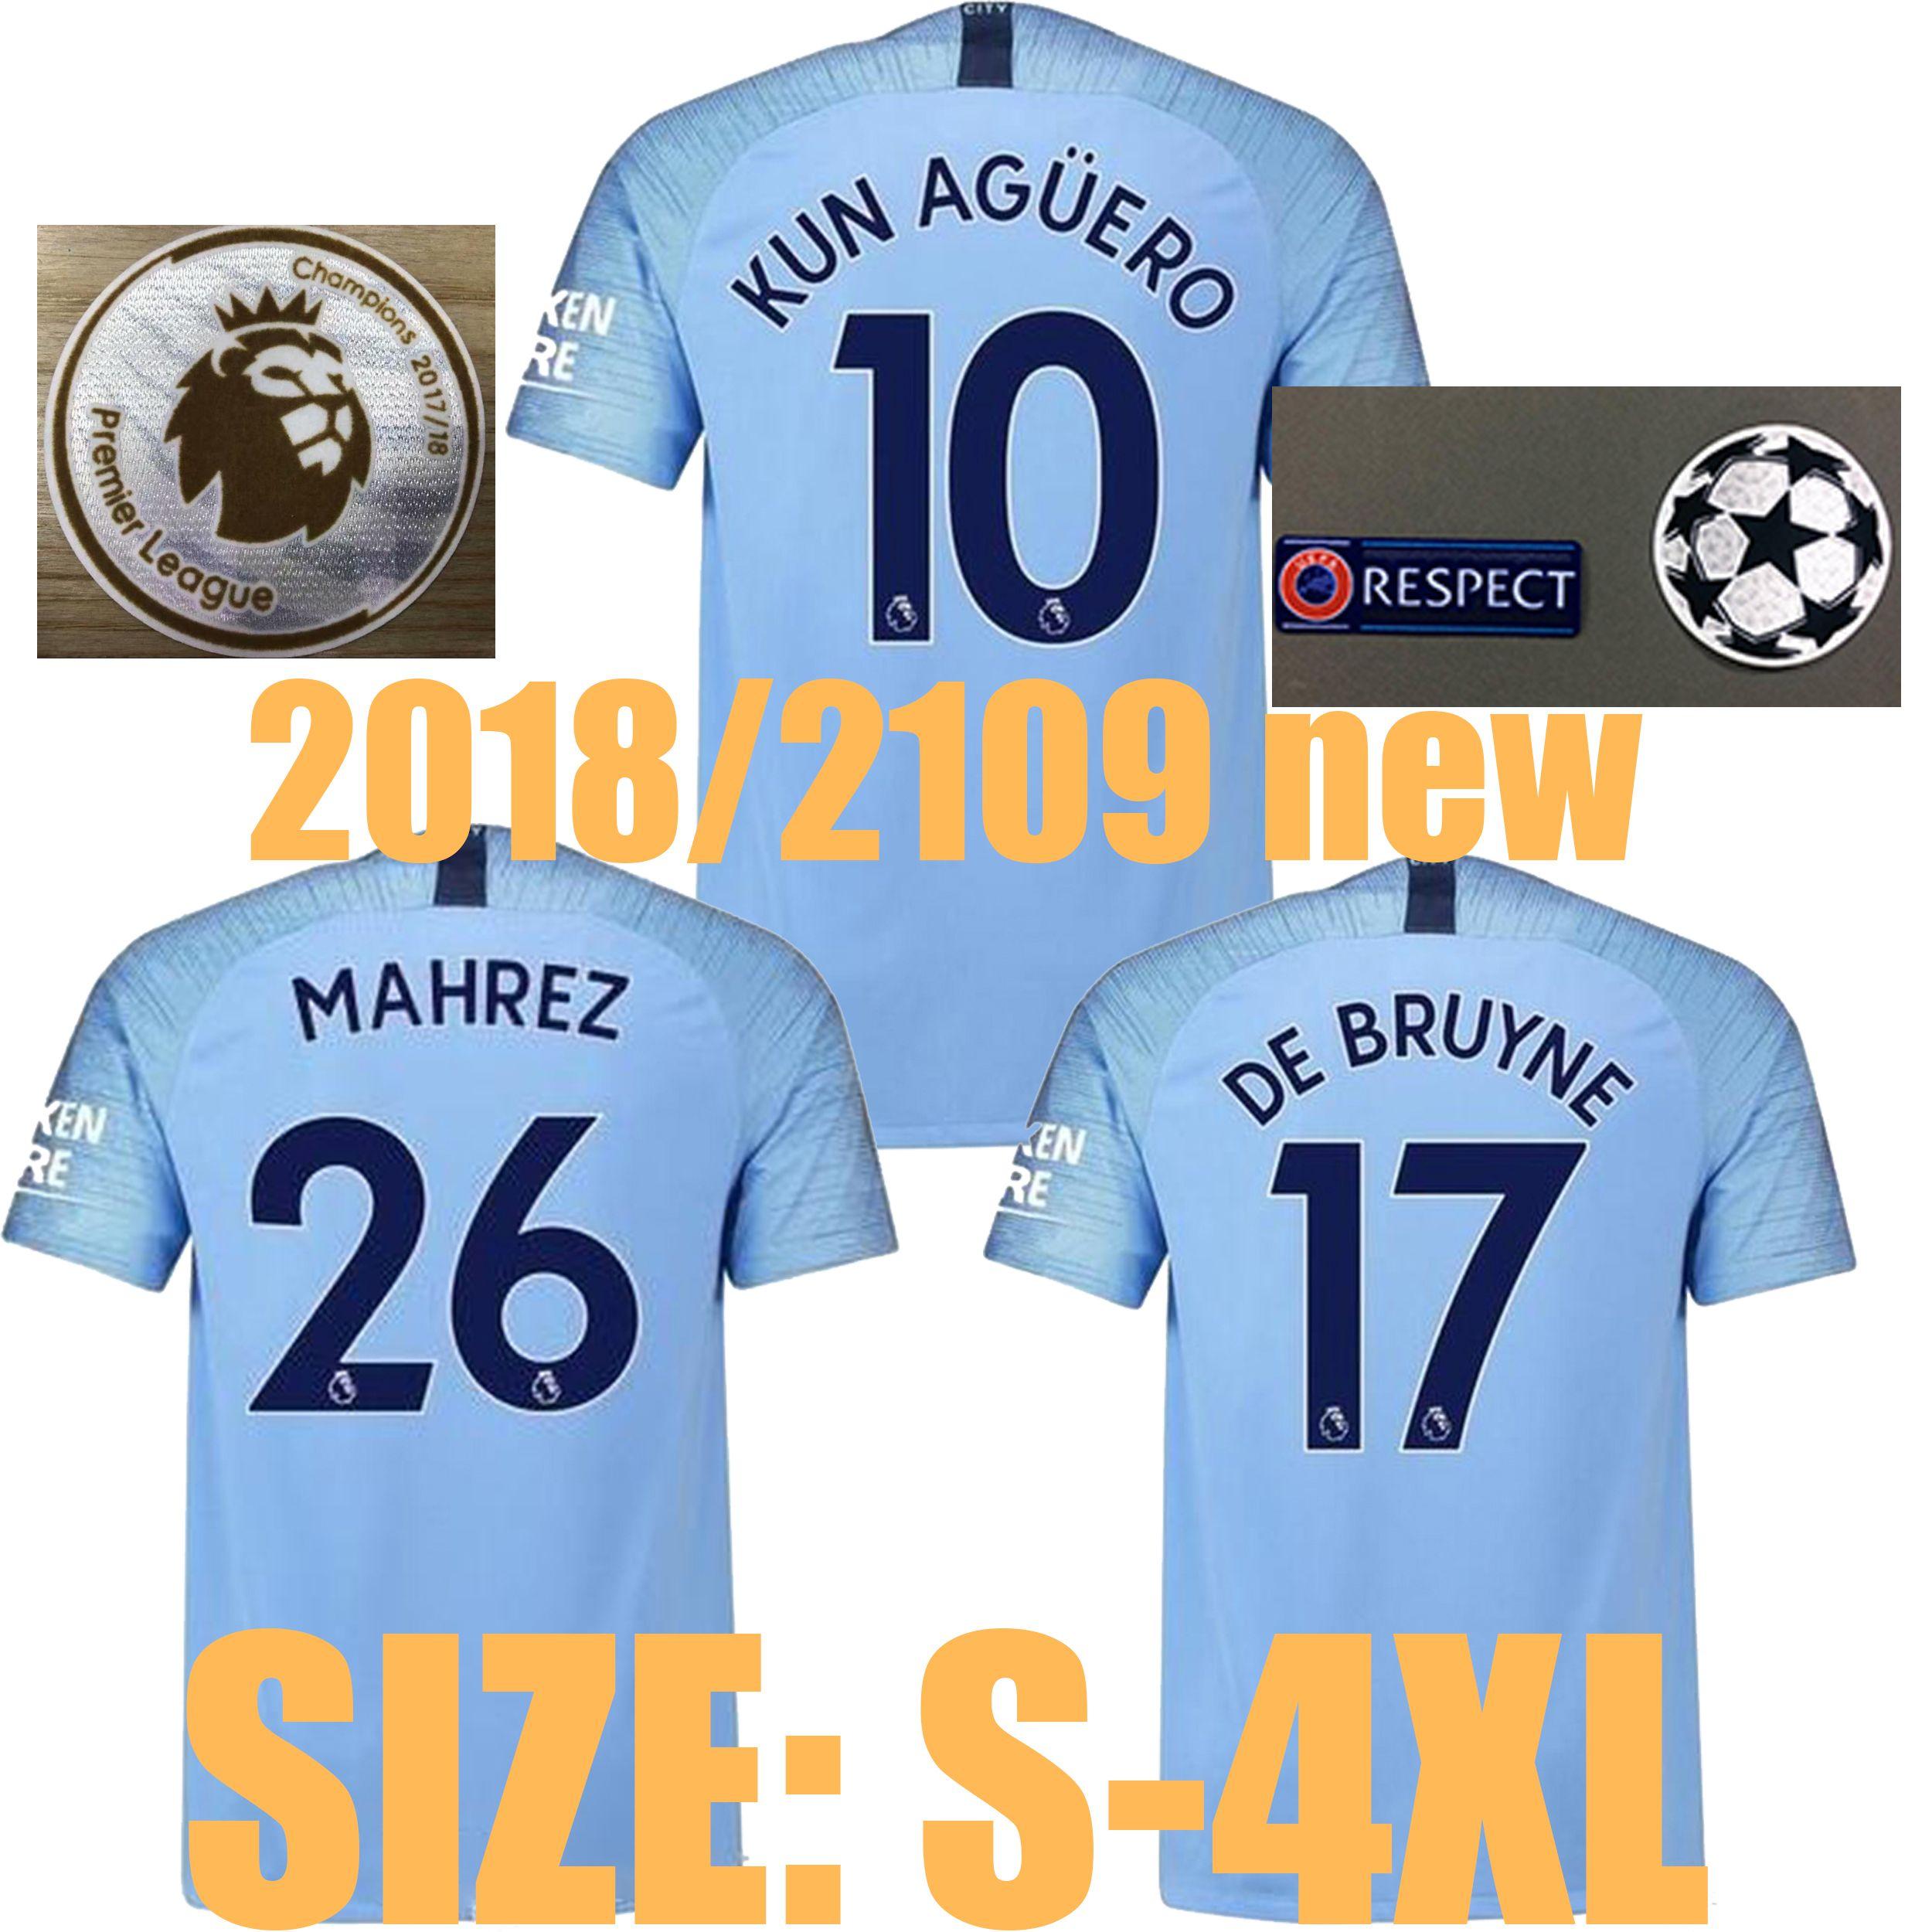 57d2f9c4aba 2019 SIZE S 4XL 2018 2019 Man City Soccer Jersey 2018 2019 MAHREZ KUN  AGUERO SANE G.JESUS DE BRUYNE 2018 Man City Football Shirts From  Bao3667183, ...